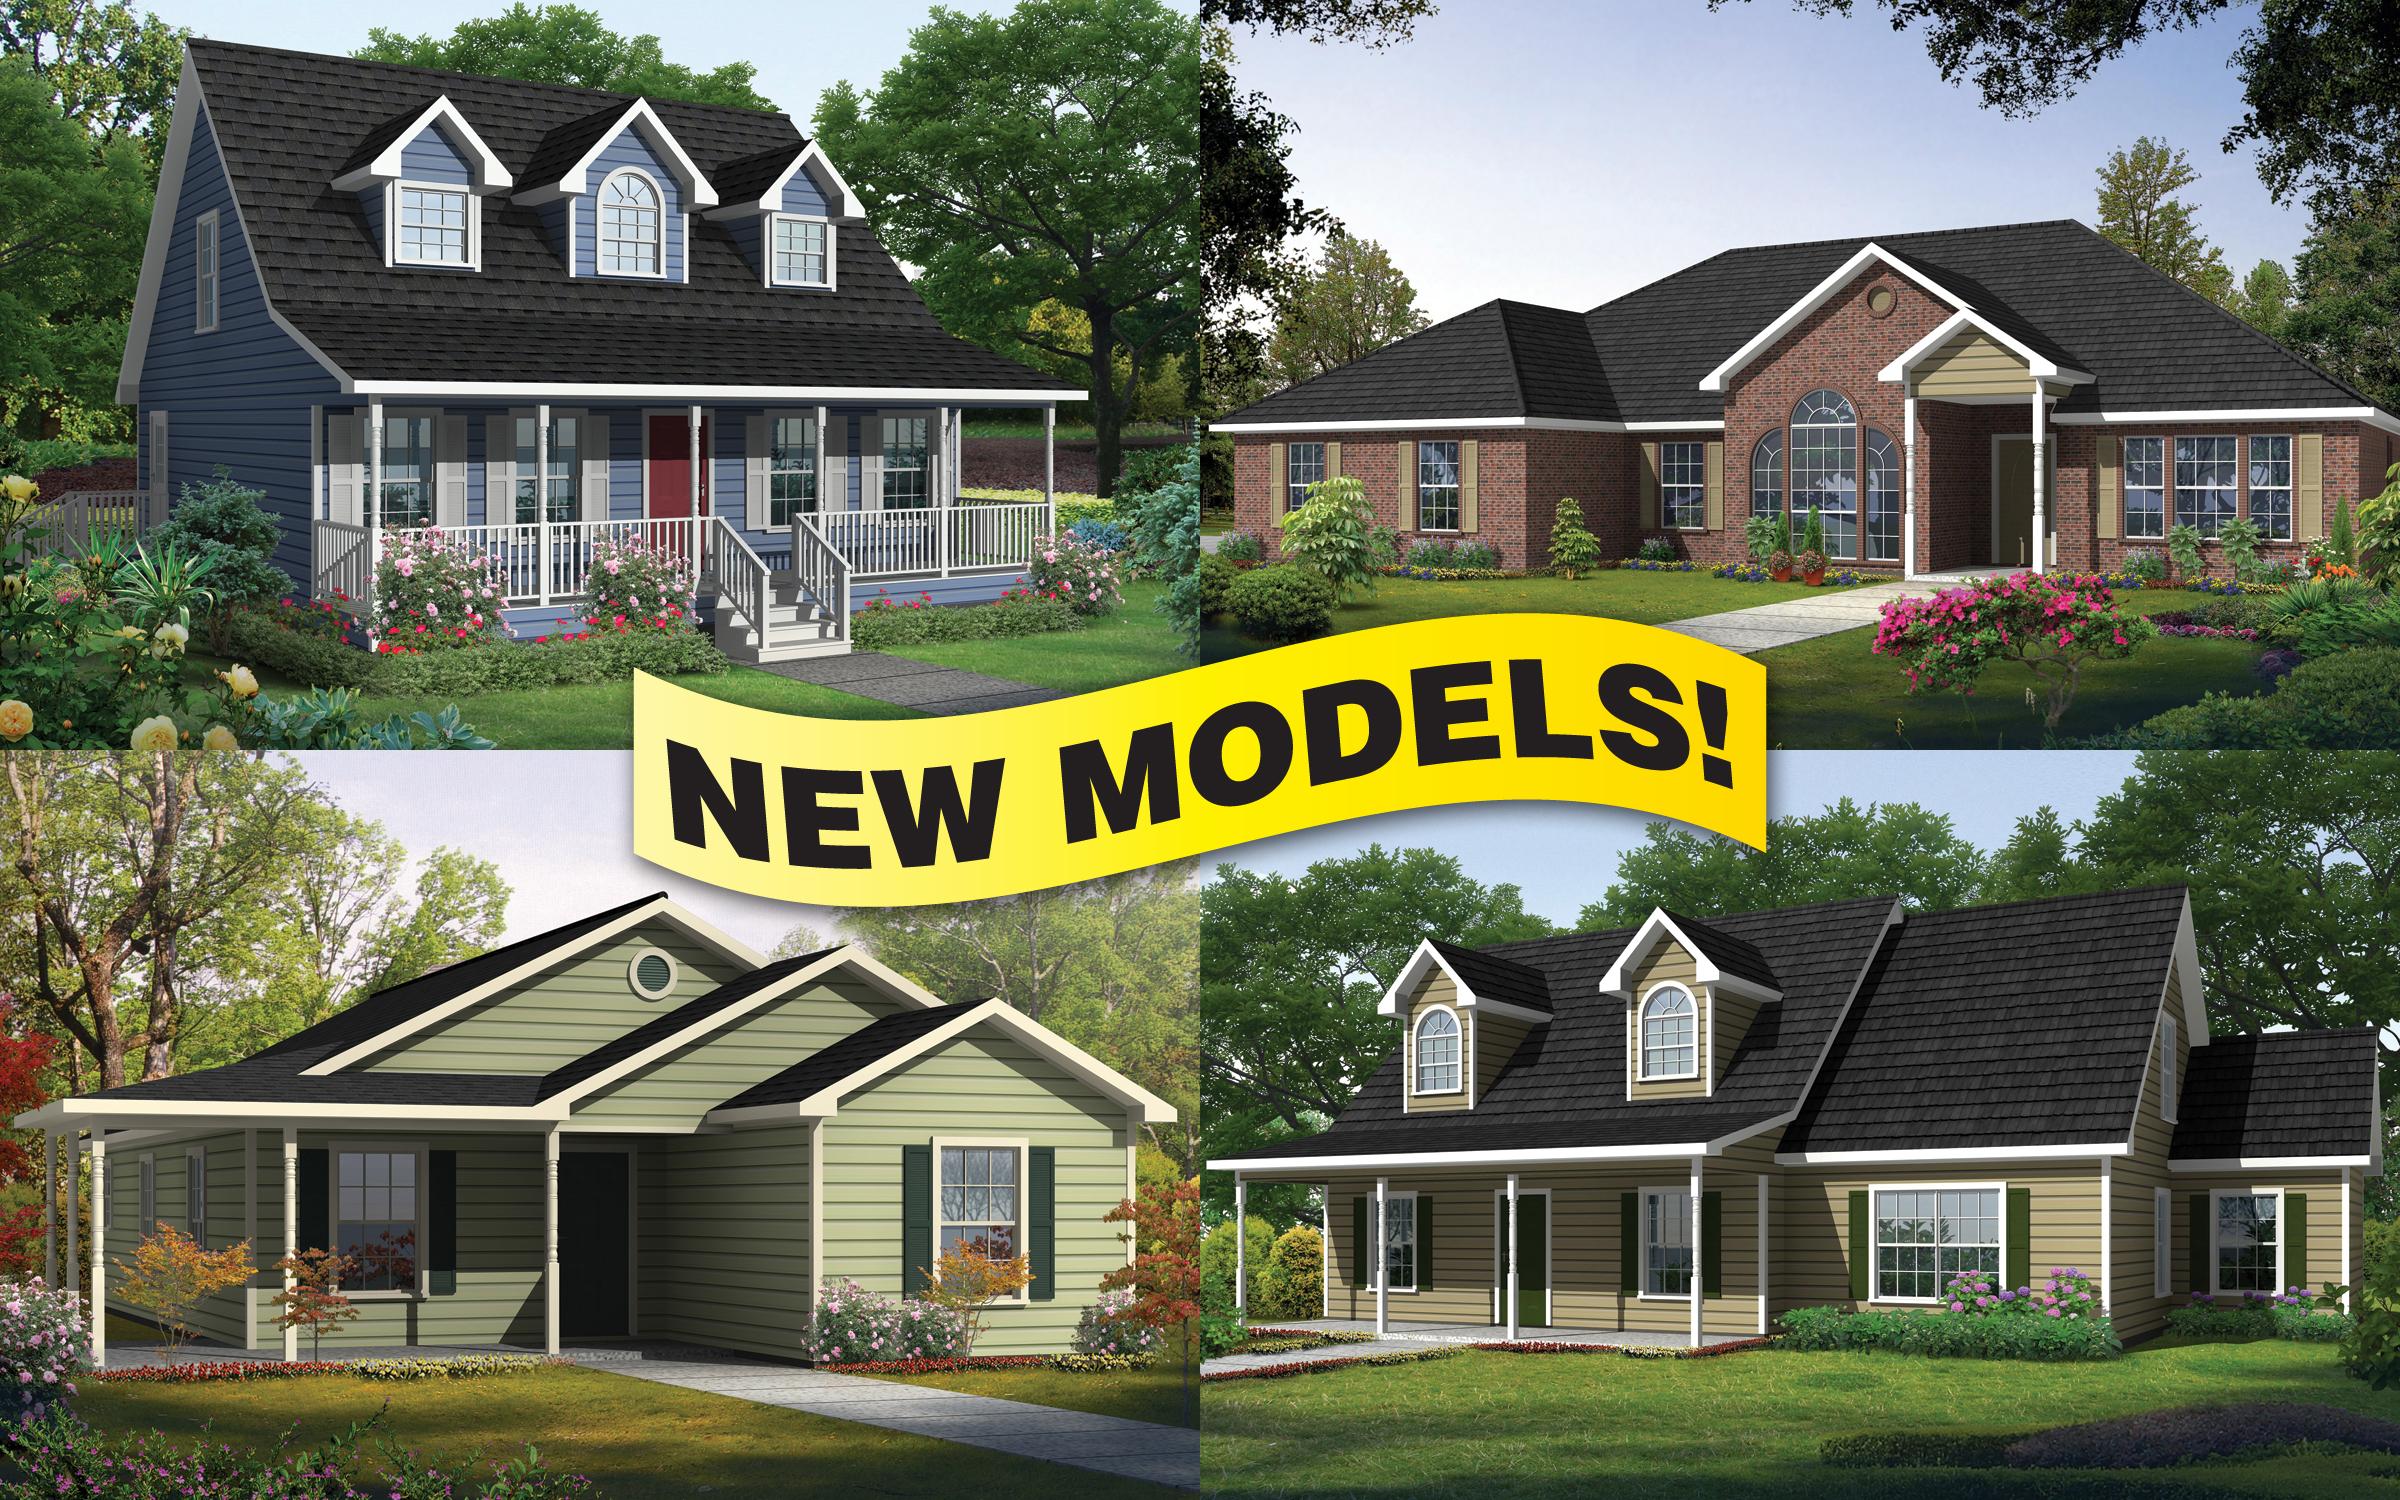 United Bilt Homes Adds 22 New Models Zero Down And No